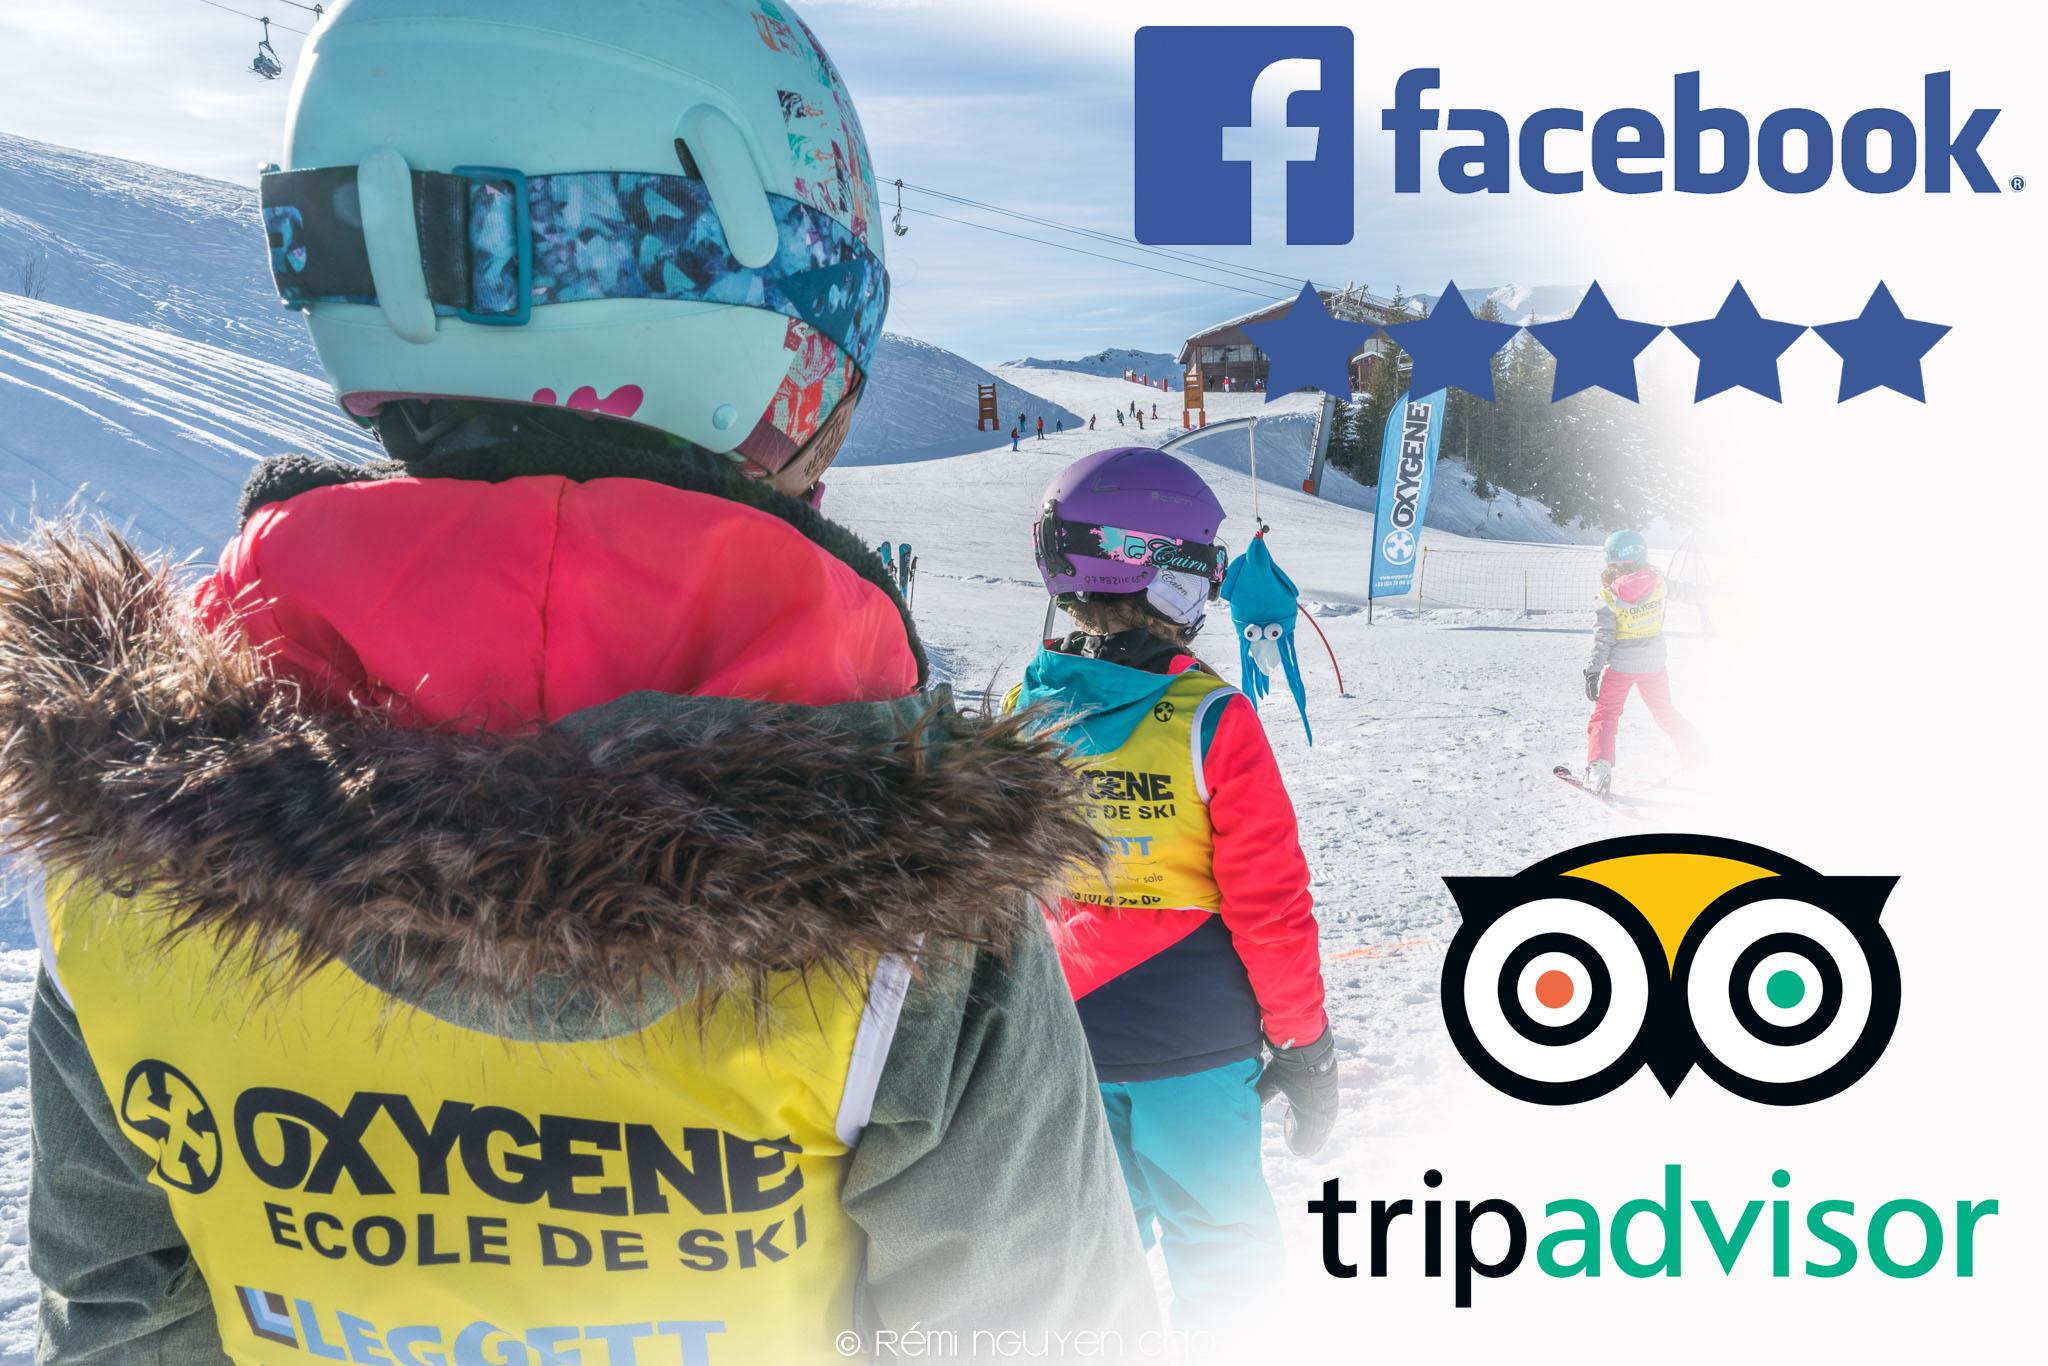 best ski lessons reviews for Oxygène ski school